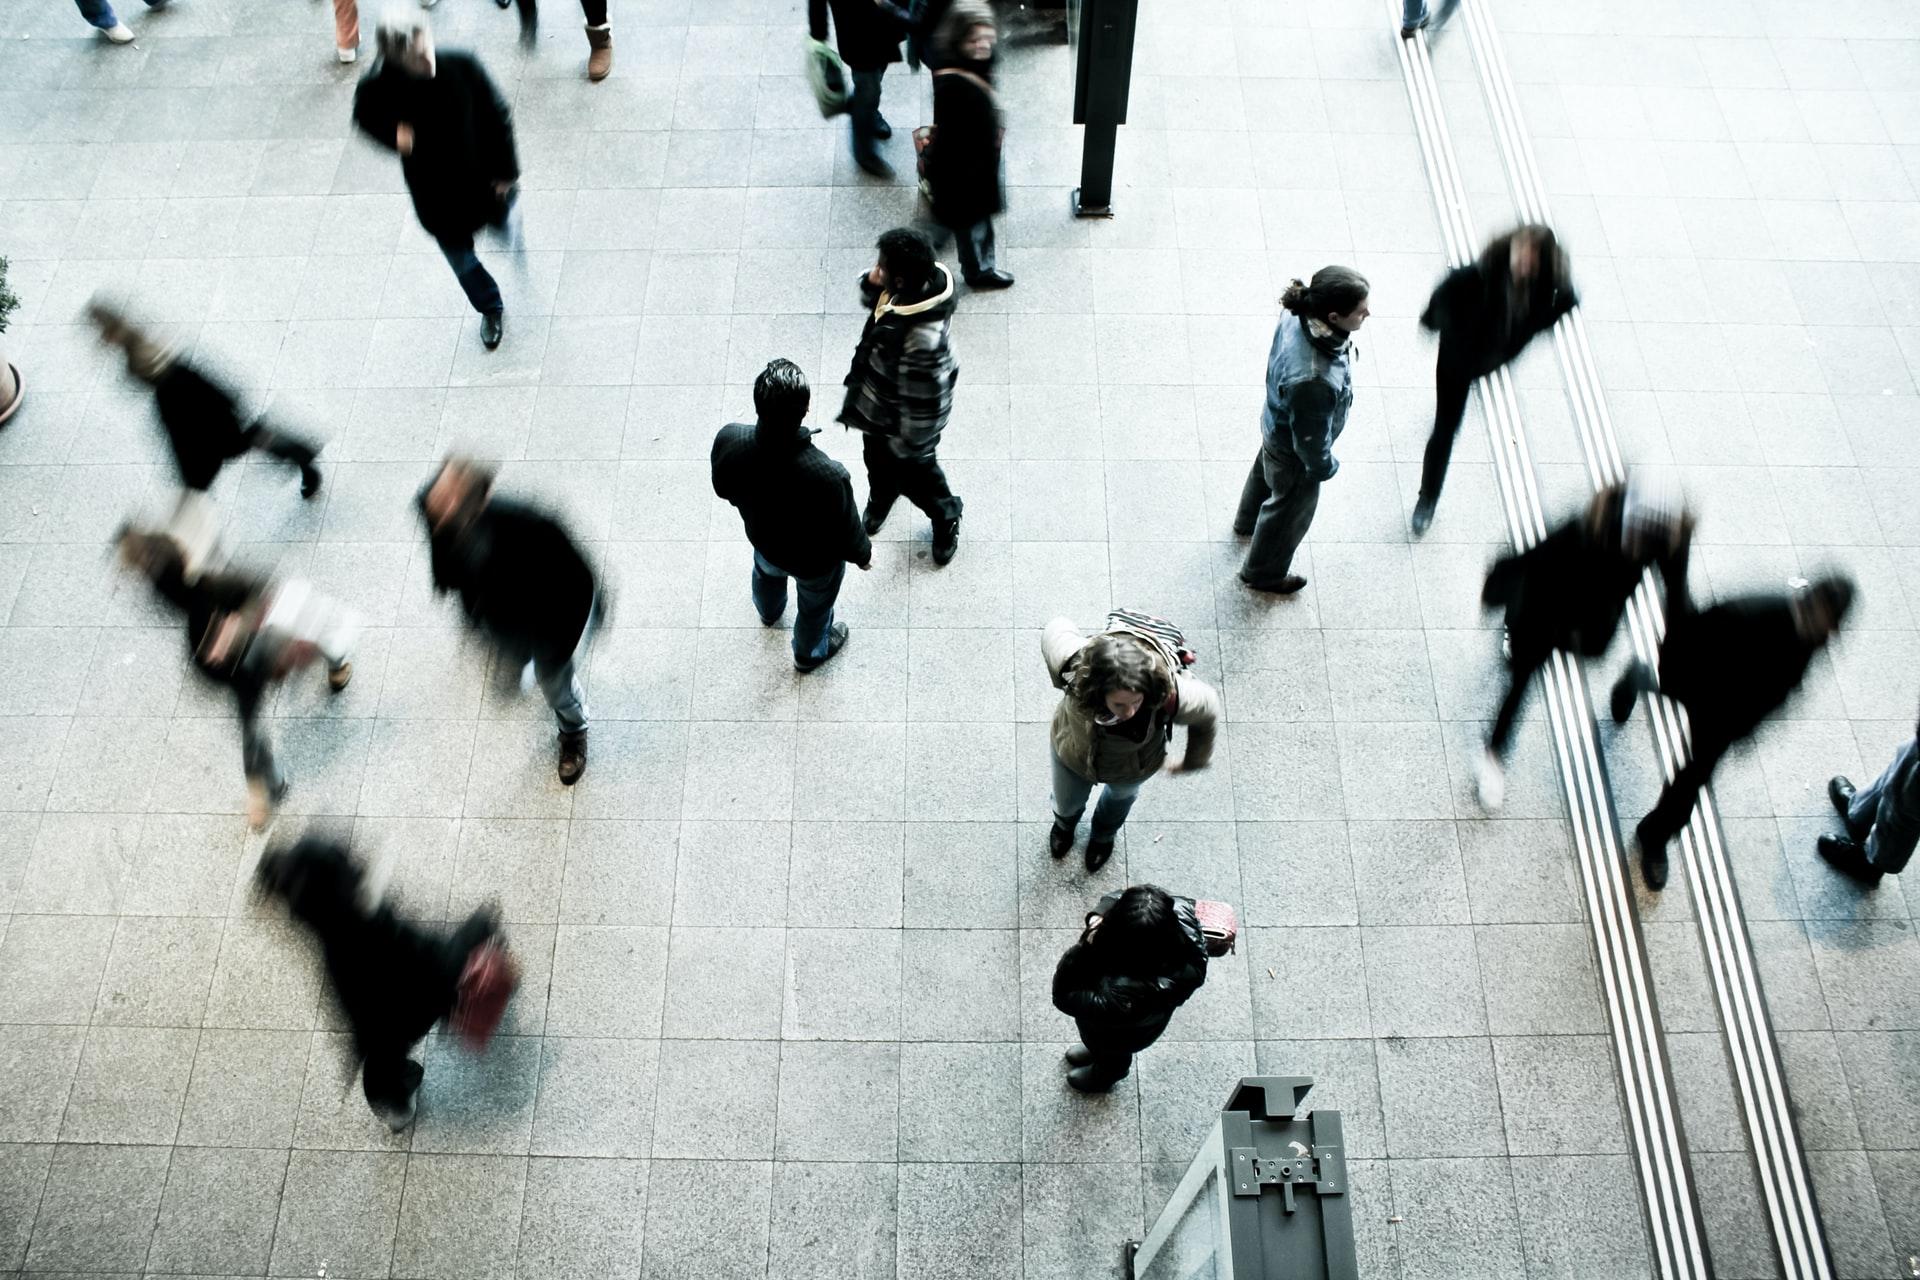 publico-alvo a andar num edificio